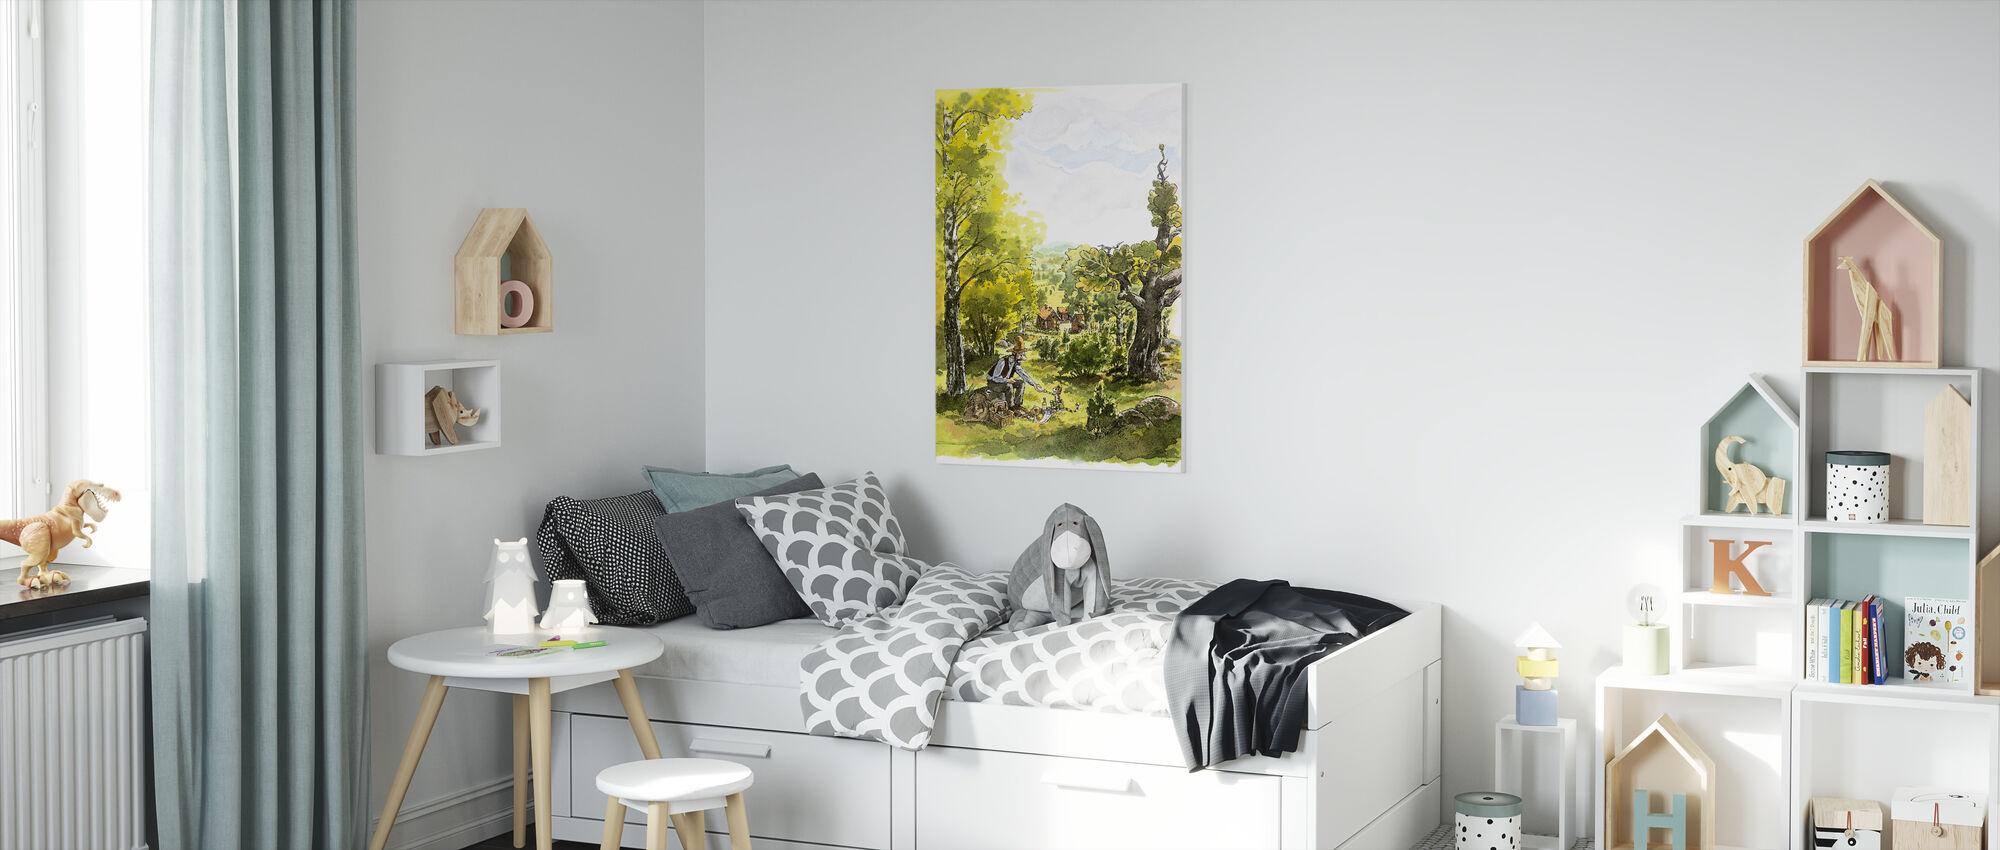 Pettson and Findus -Pettson tents - Picnic - Canvas print - Kids Room